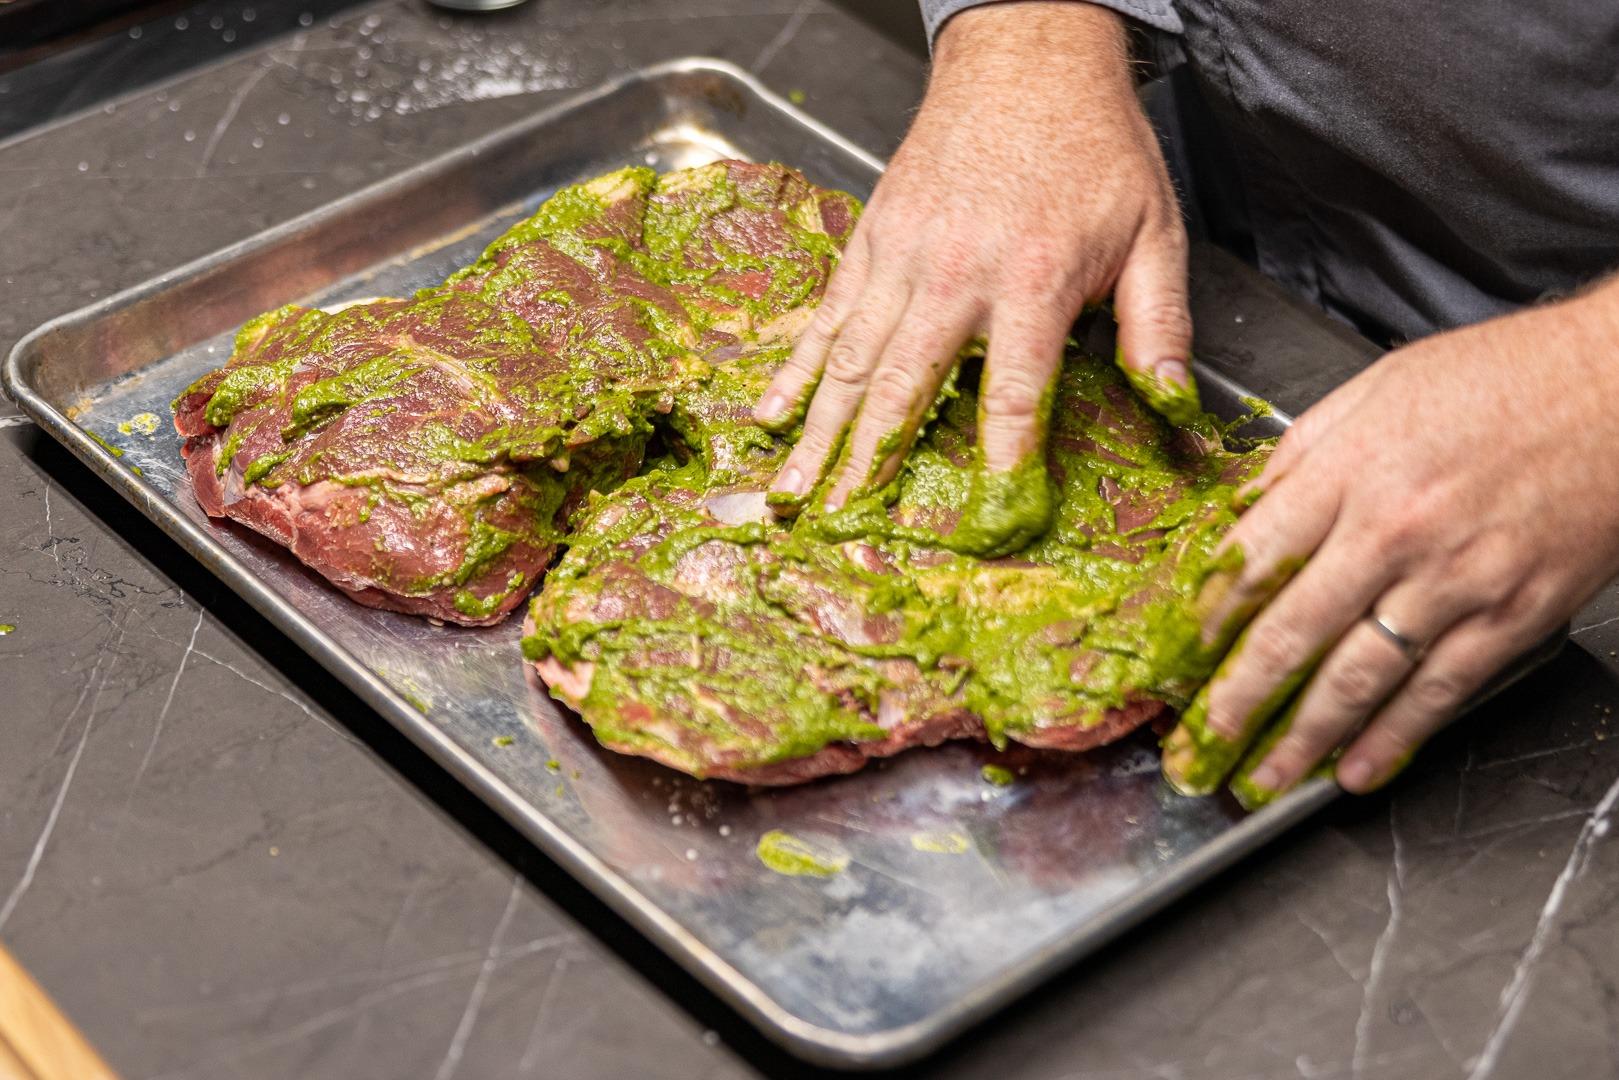 smearing the herb seasoning paste onto the leg of lamb